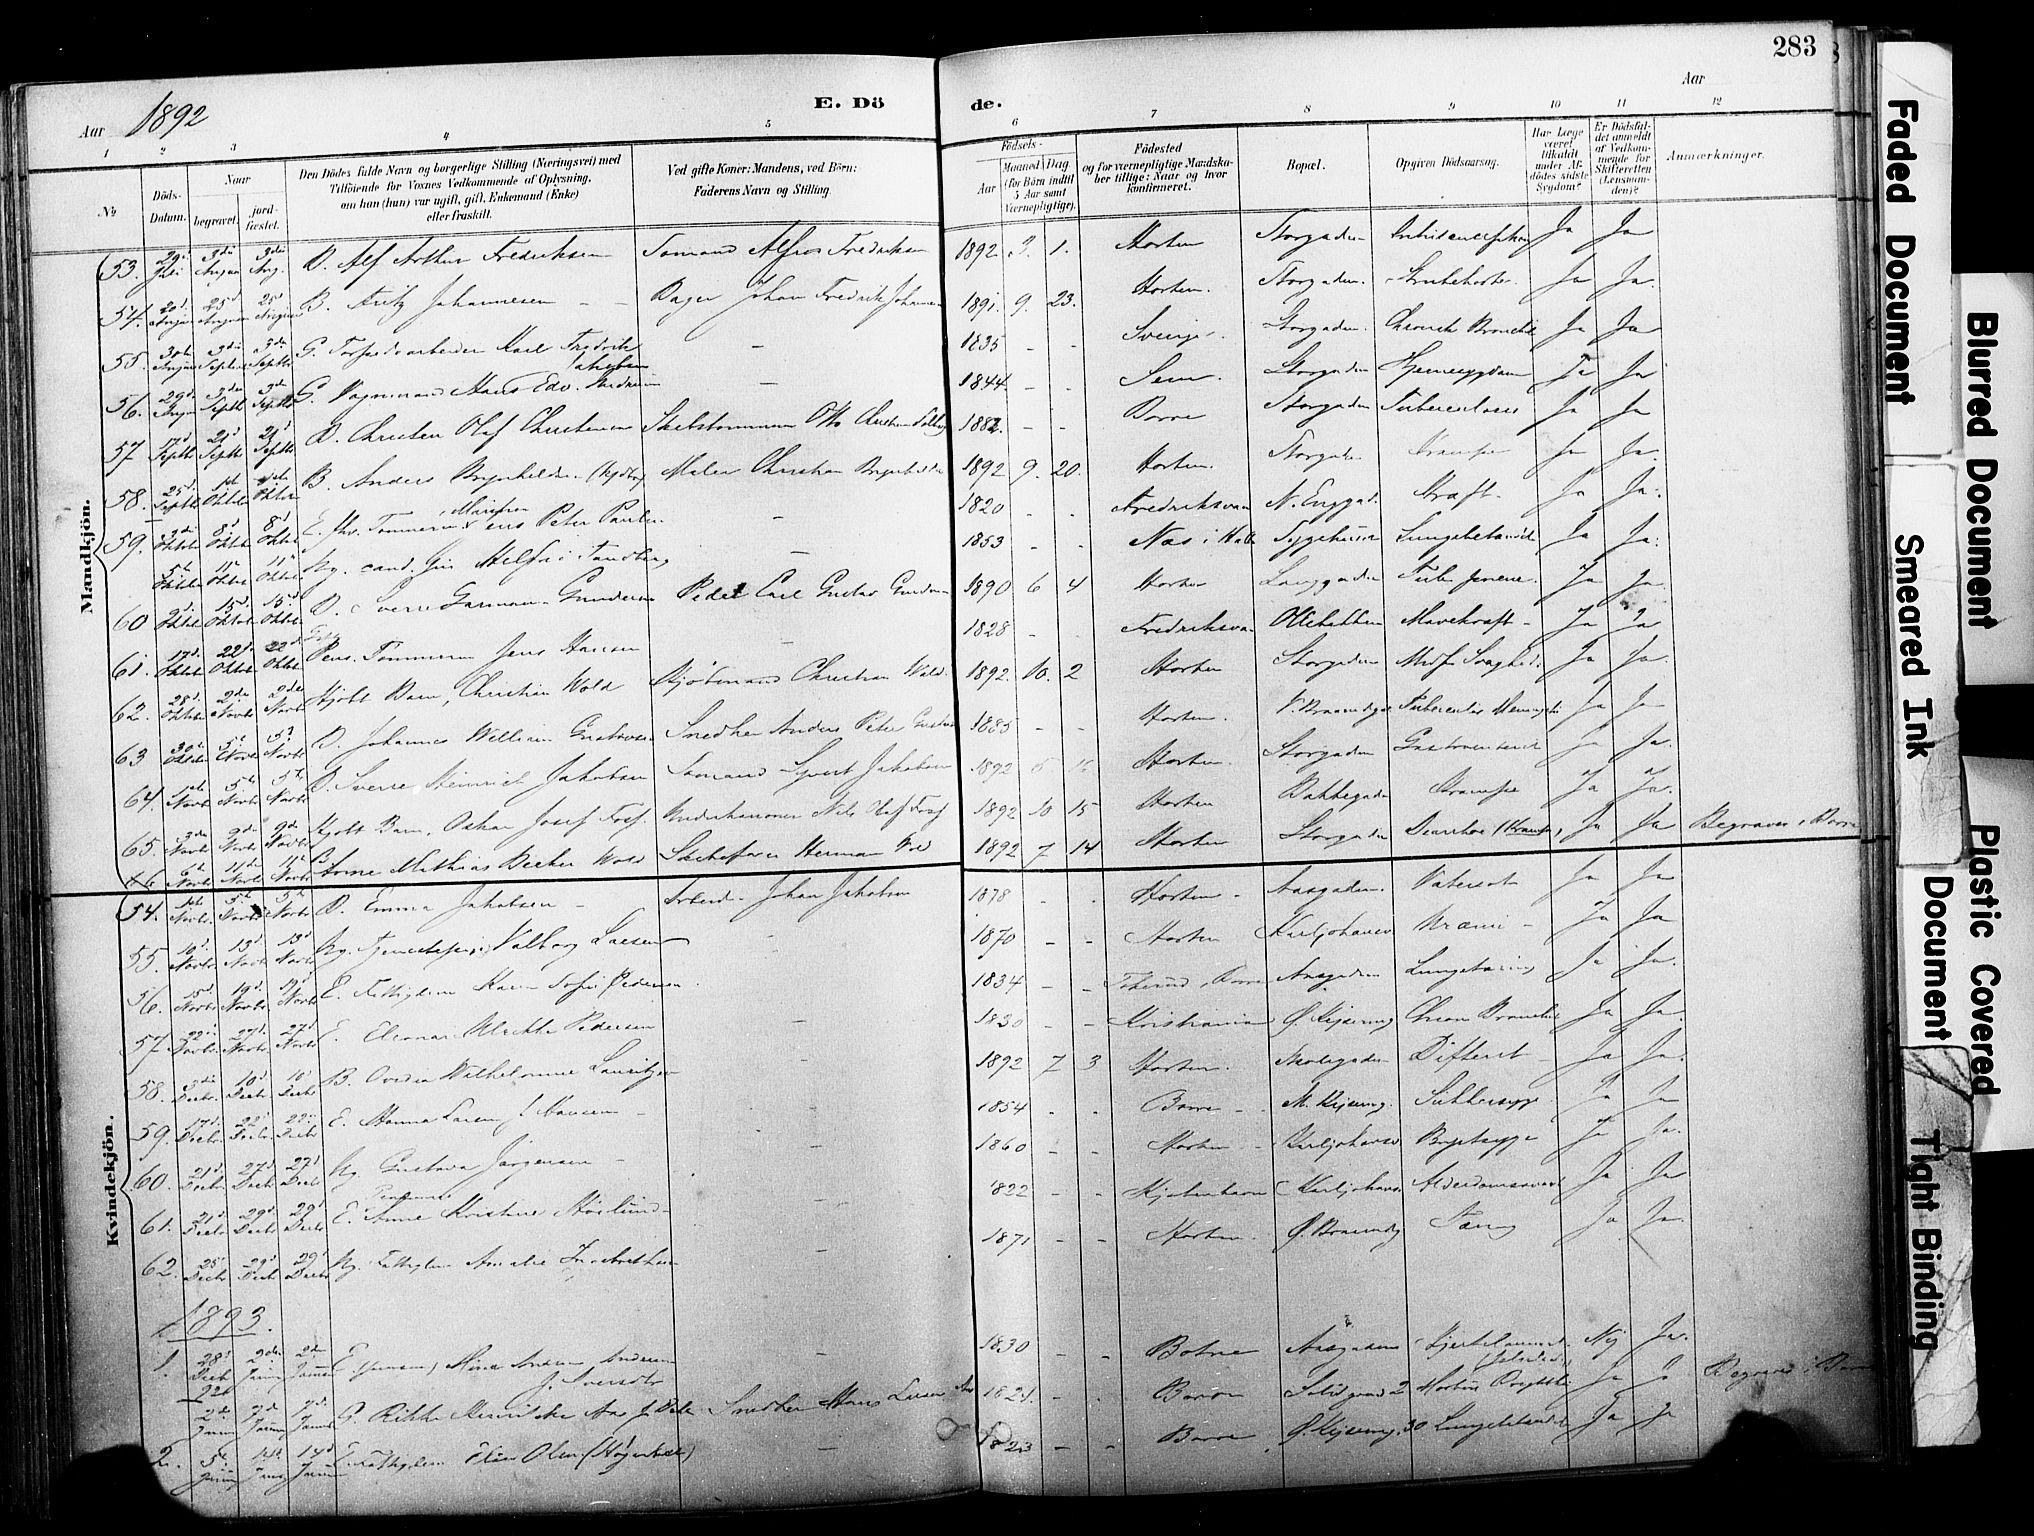 SAKO, Horten kirkebøker, F/Fa/L0004: Parish register (official) no. 4, 1888-1895, p. 283